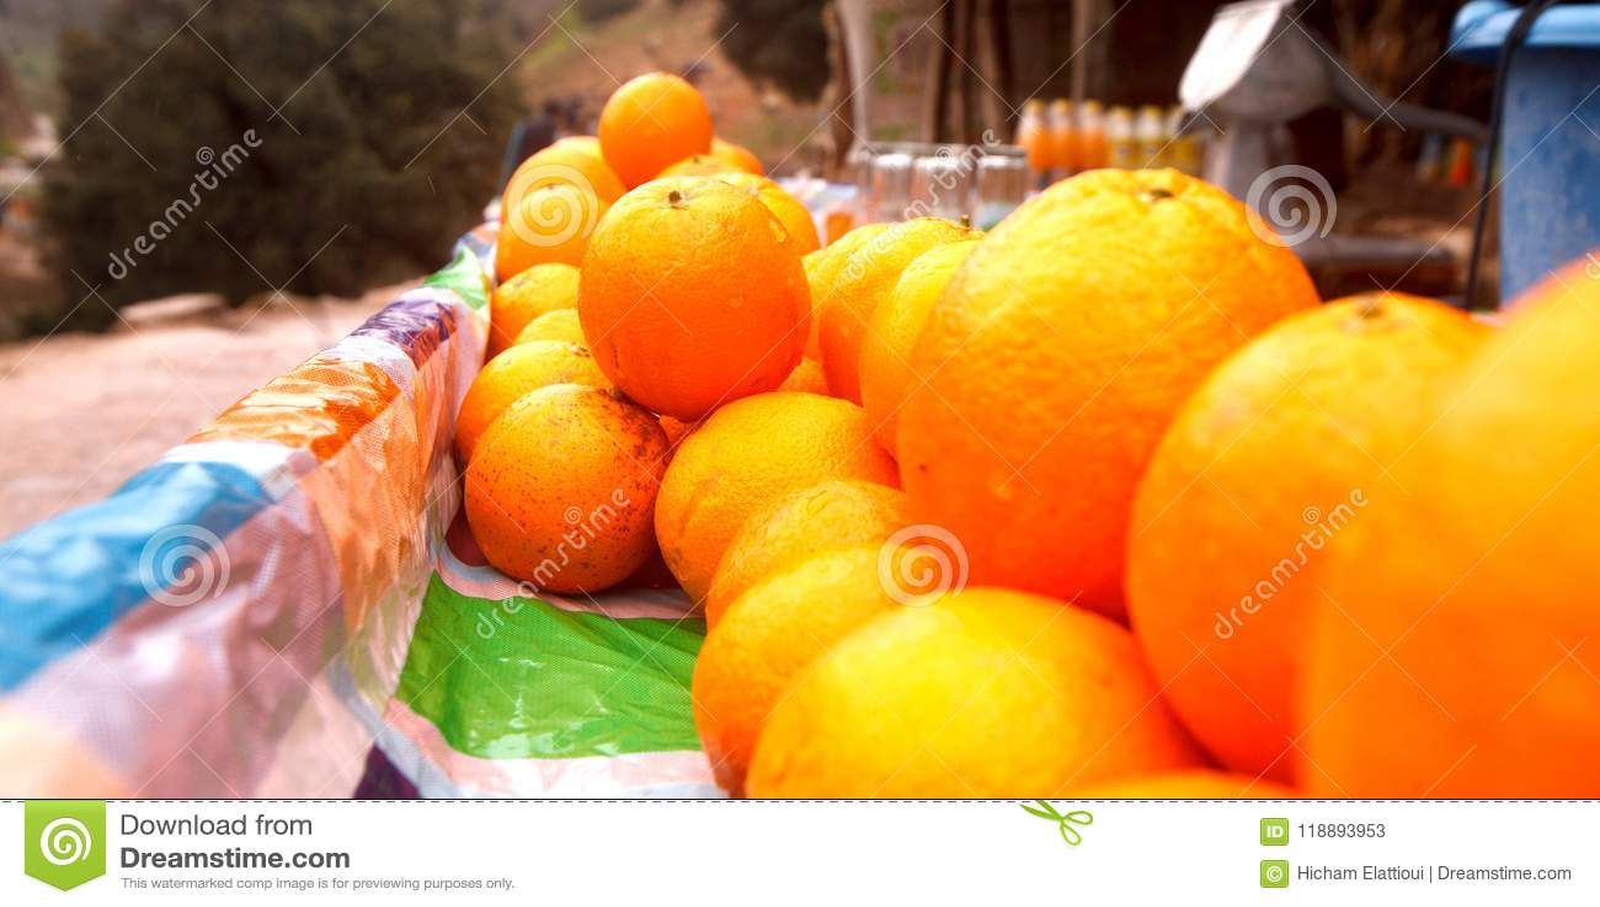 Sellers of oranges on streets